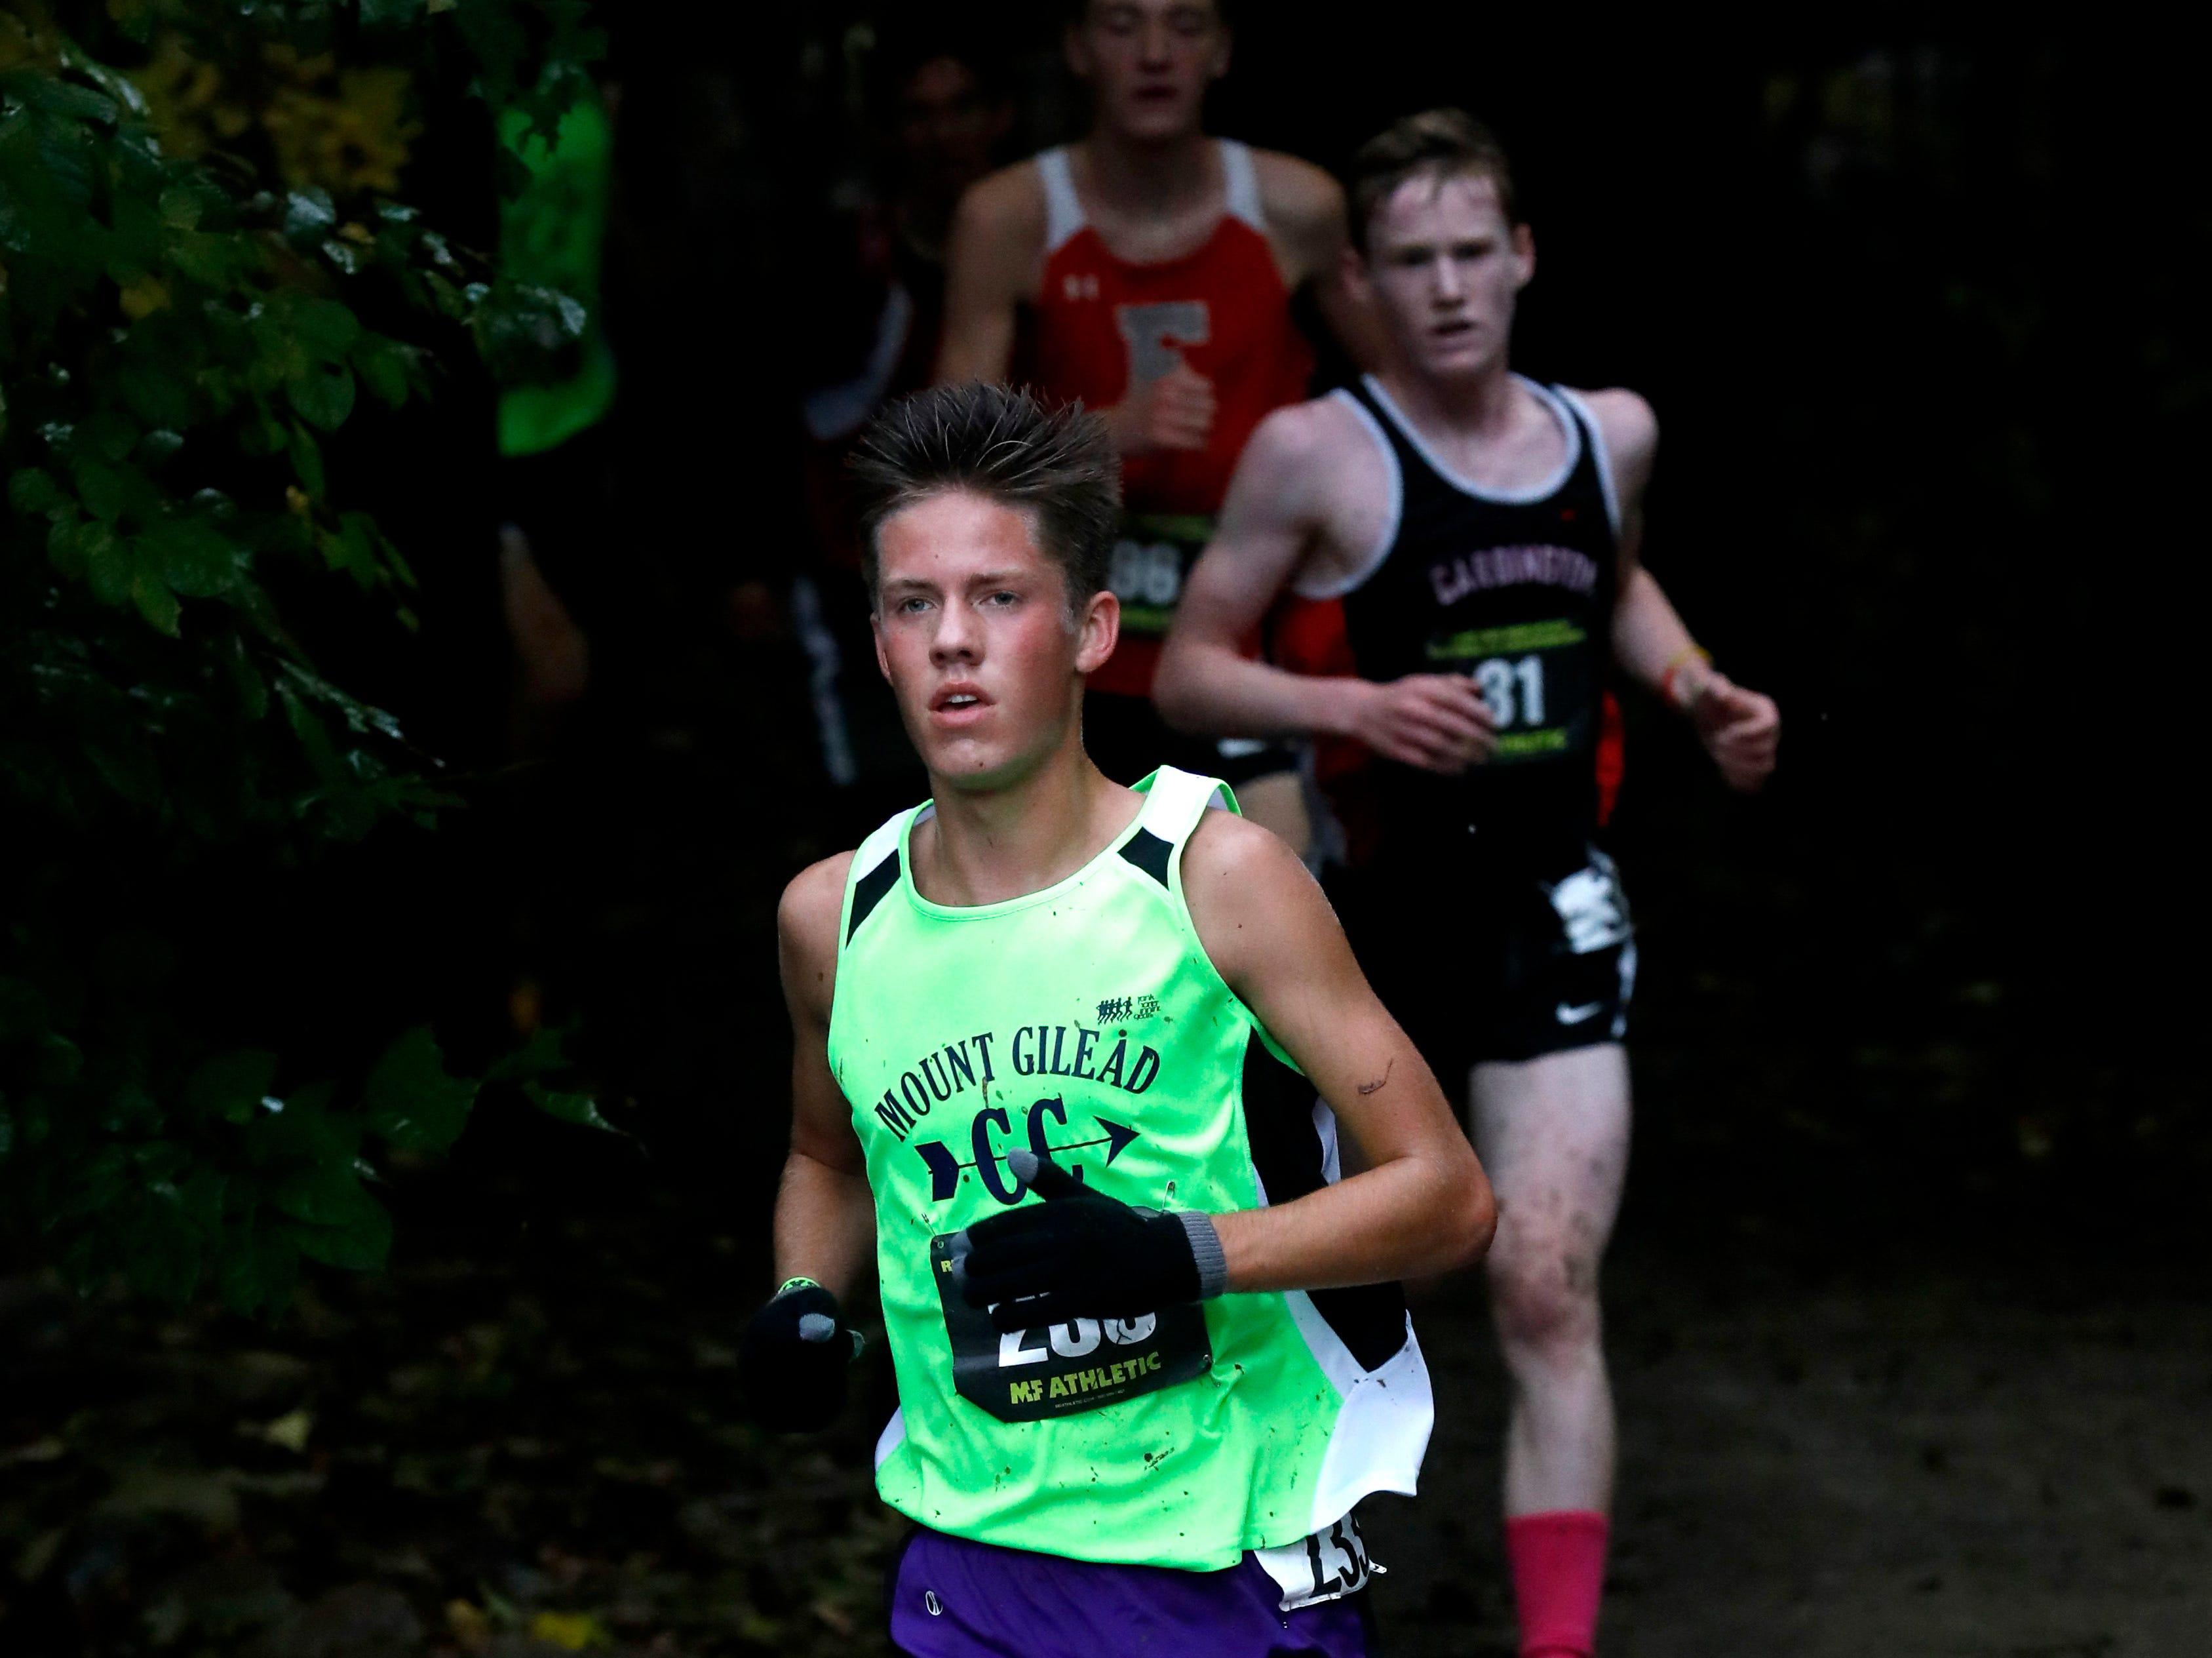 Mount Gilead's Casey White runs in the Regional Cross Country meet Saturday, Oct. 27, 2018, at Pickerington North High School in Pickerington.